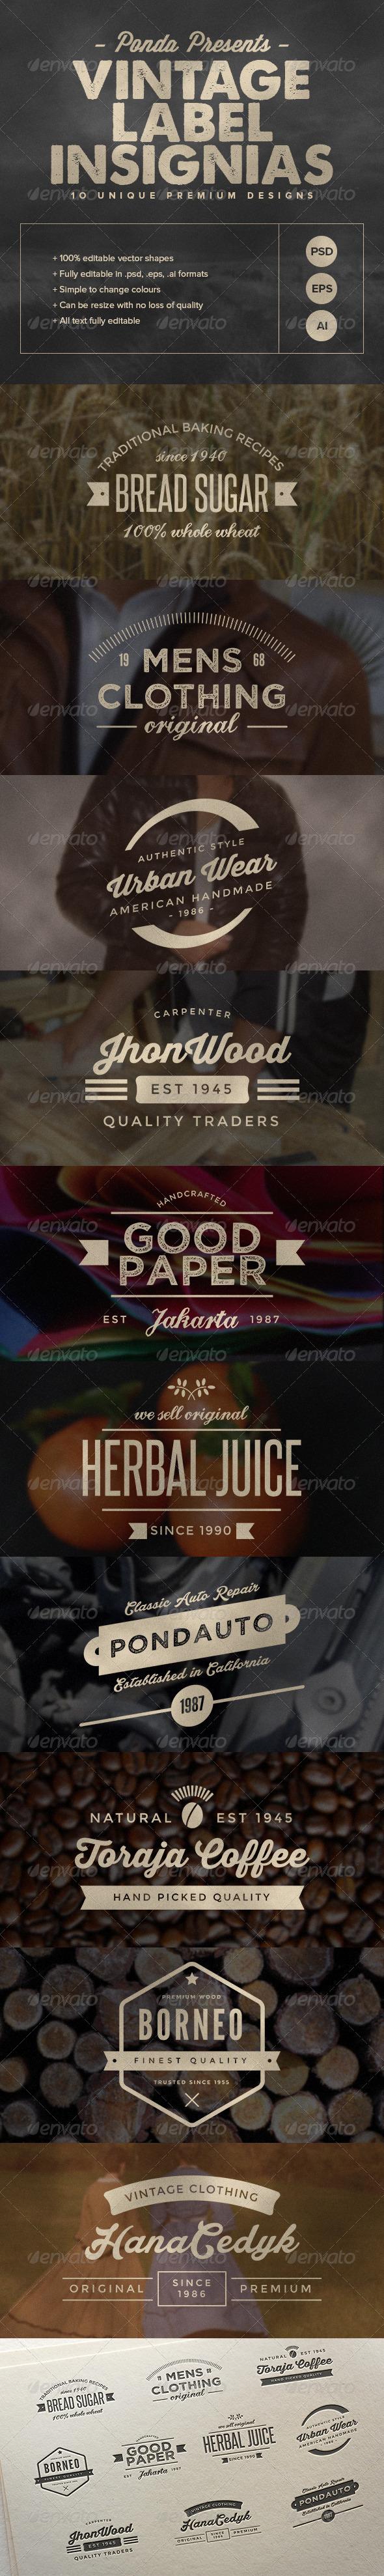 GraphicRiver Vintage Label Insignias 7576699